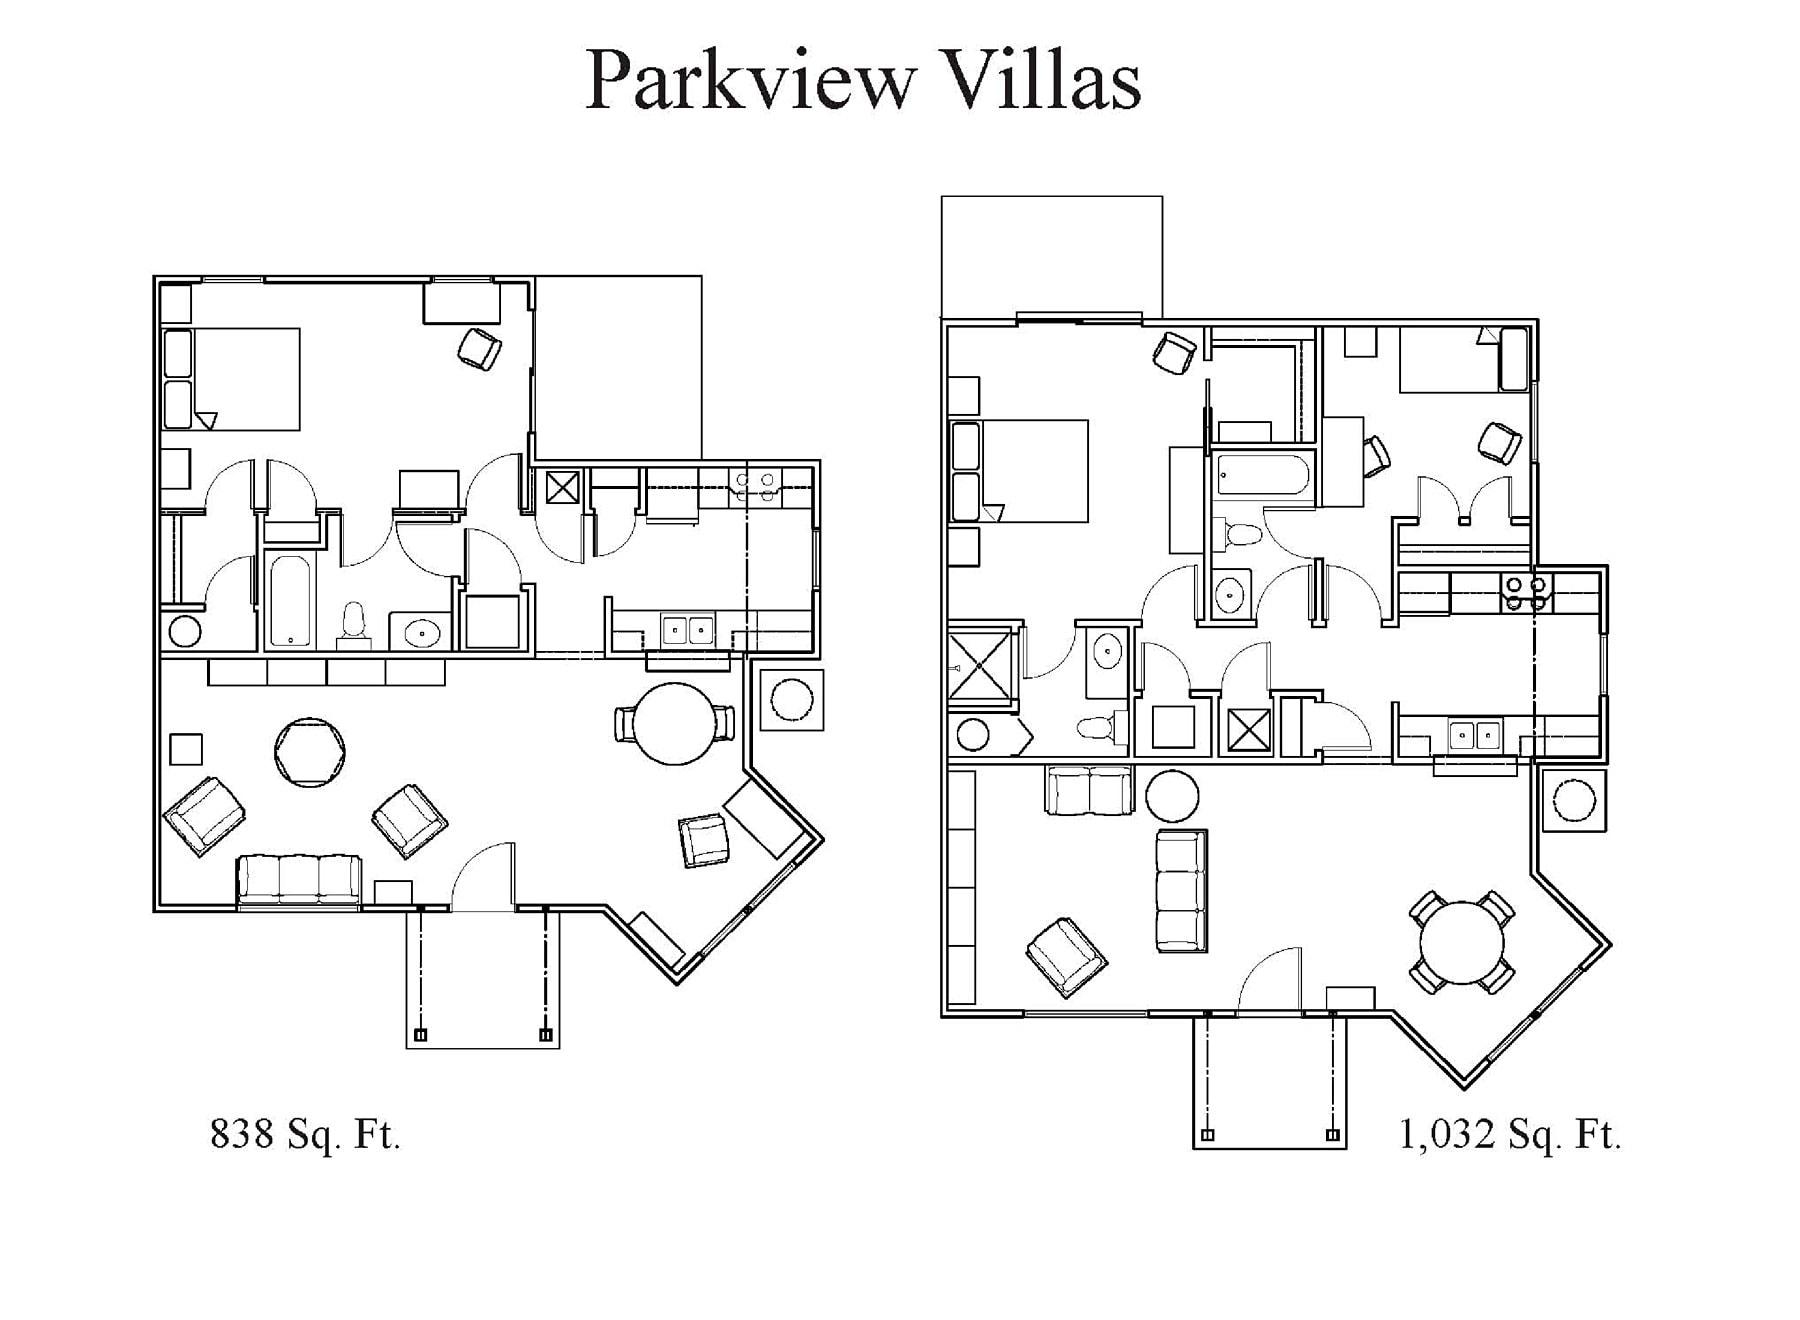 Parkview Villas Floor Plans